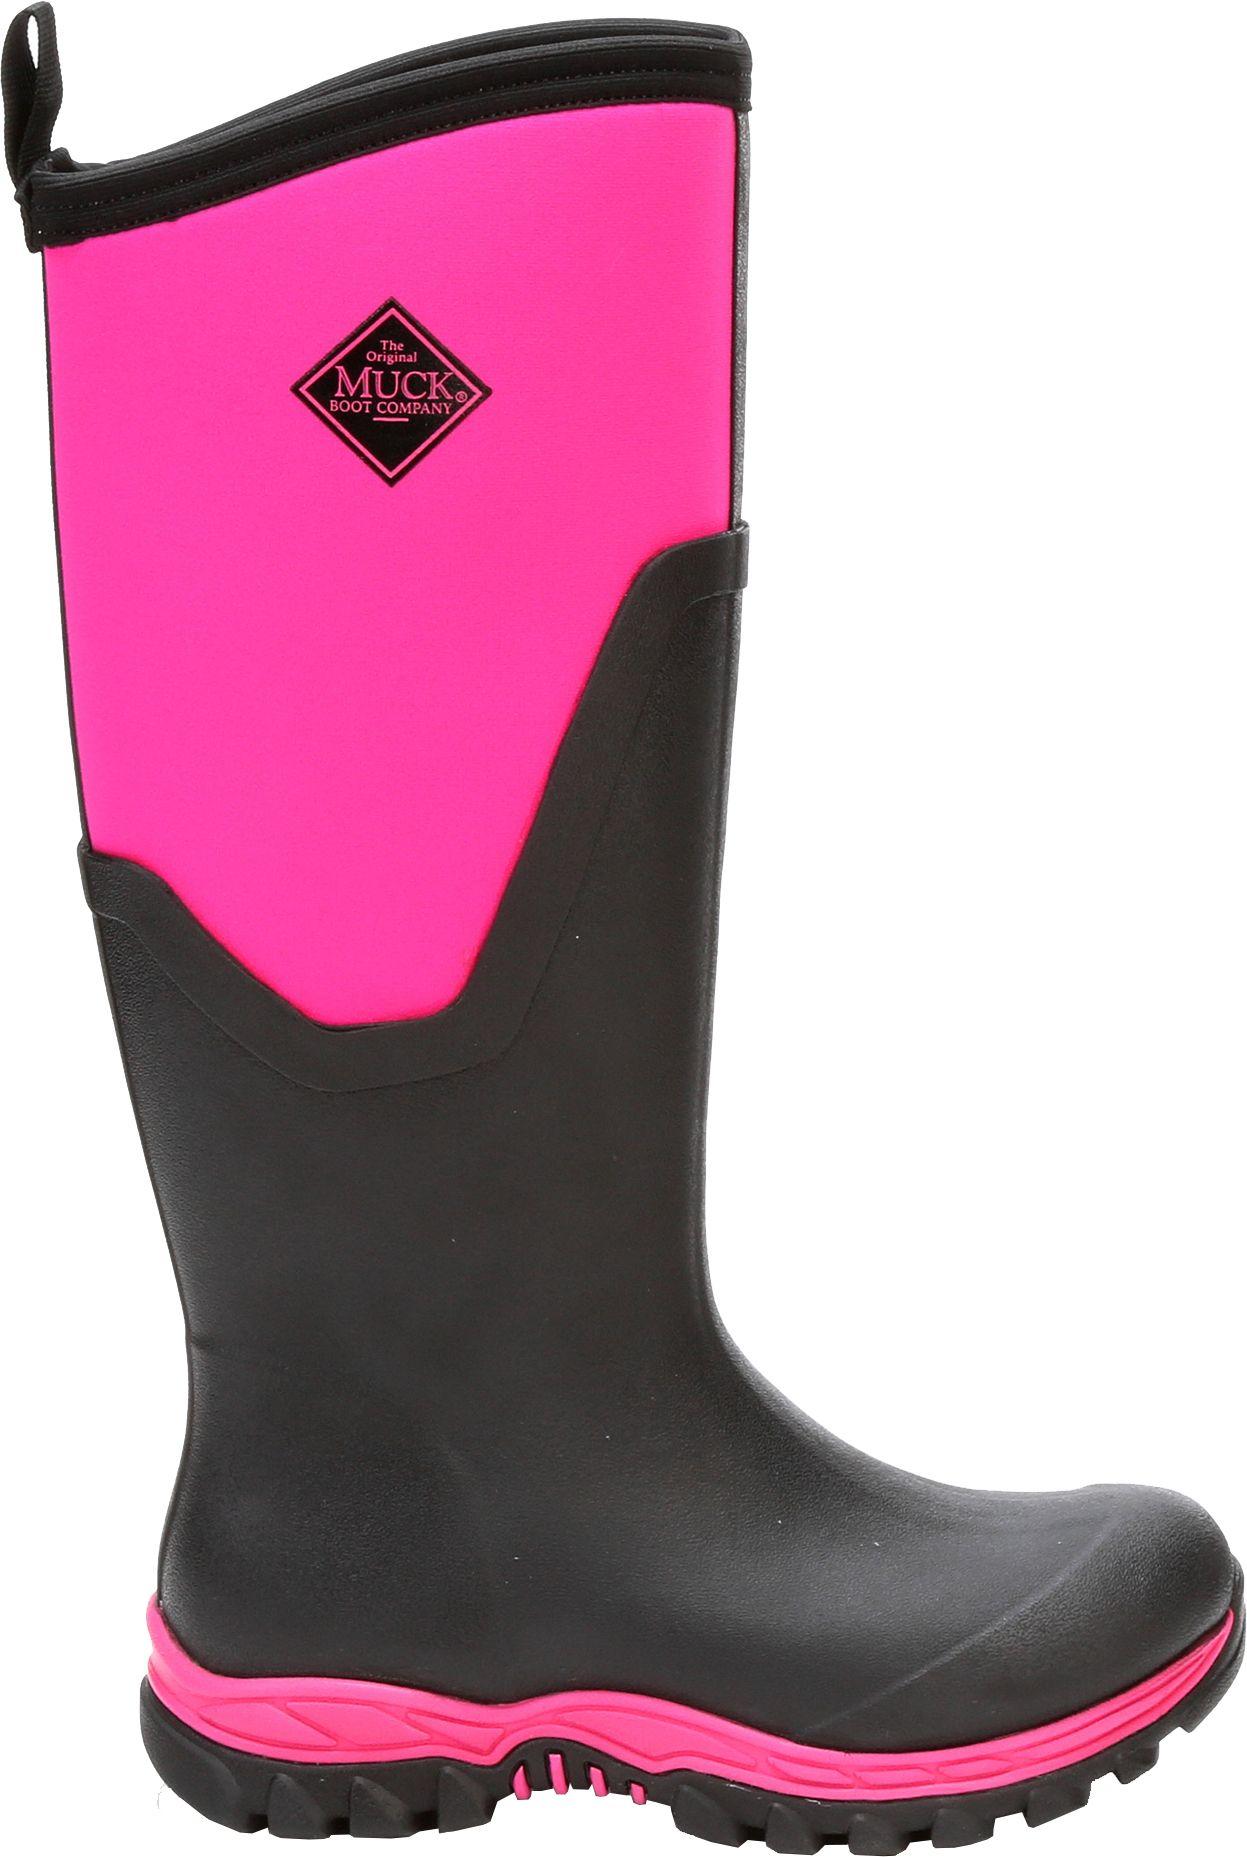 Muck Boot Women&39s Arctic Sport II Tall Winter Boots| DICK&39S